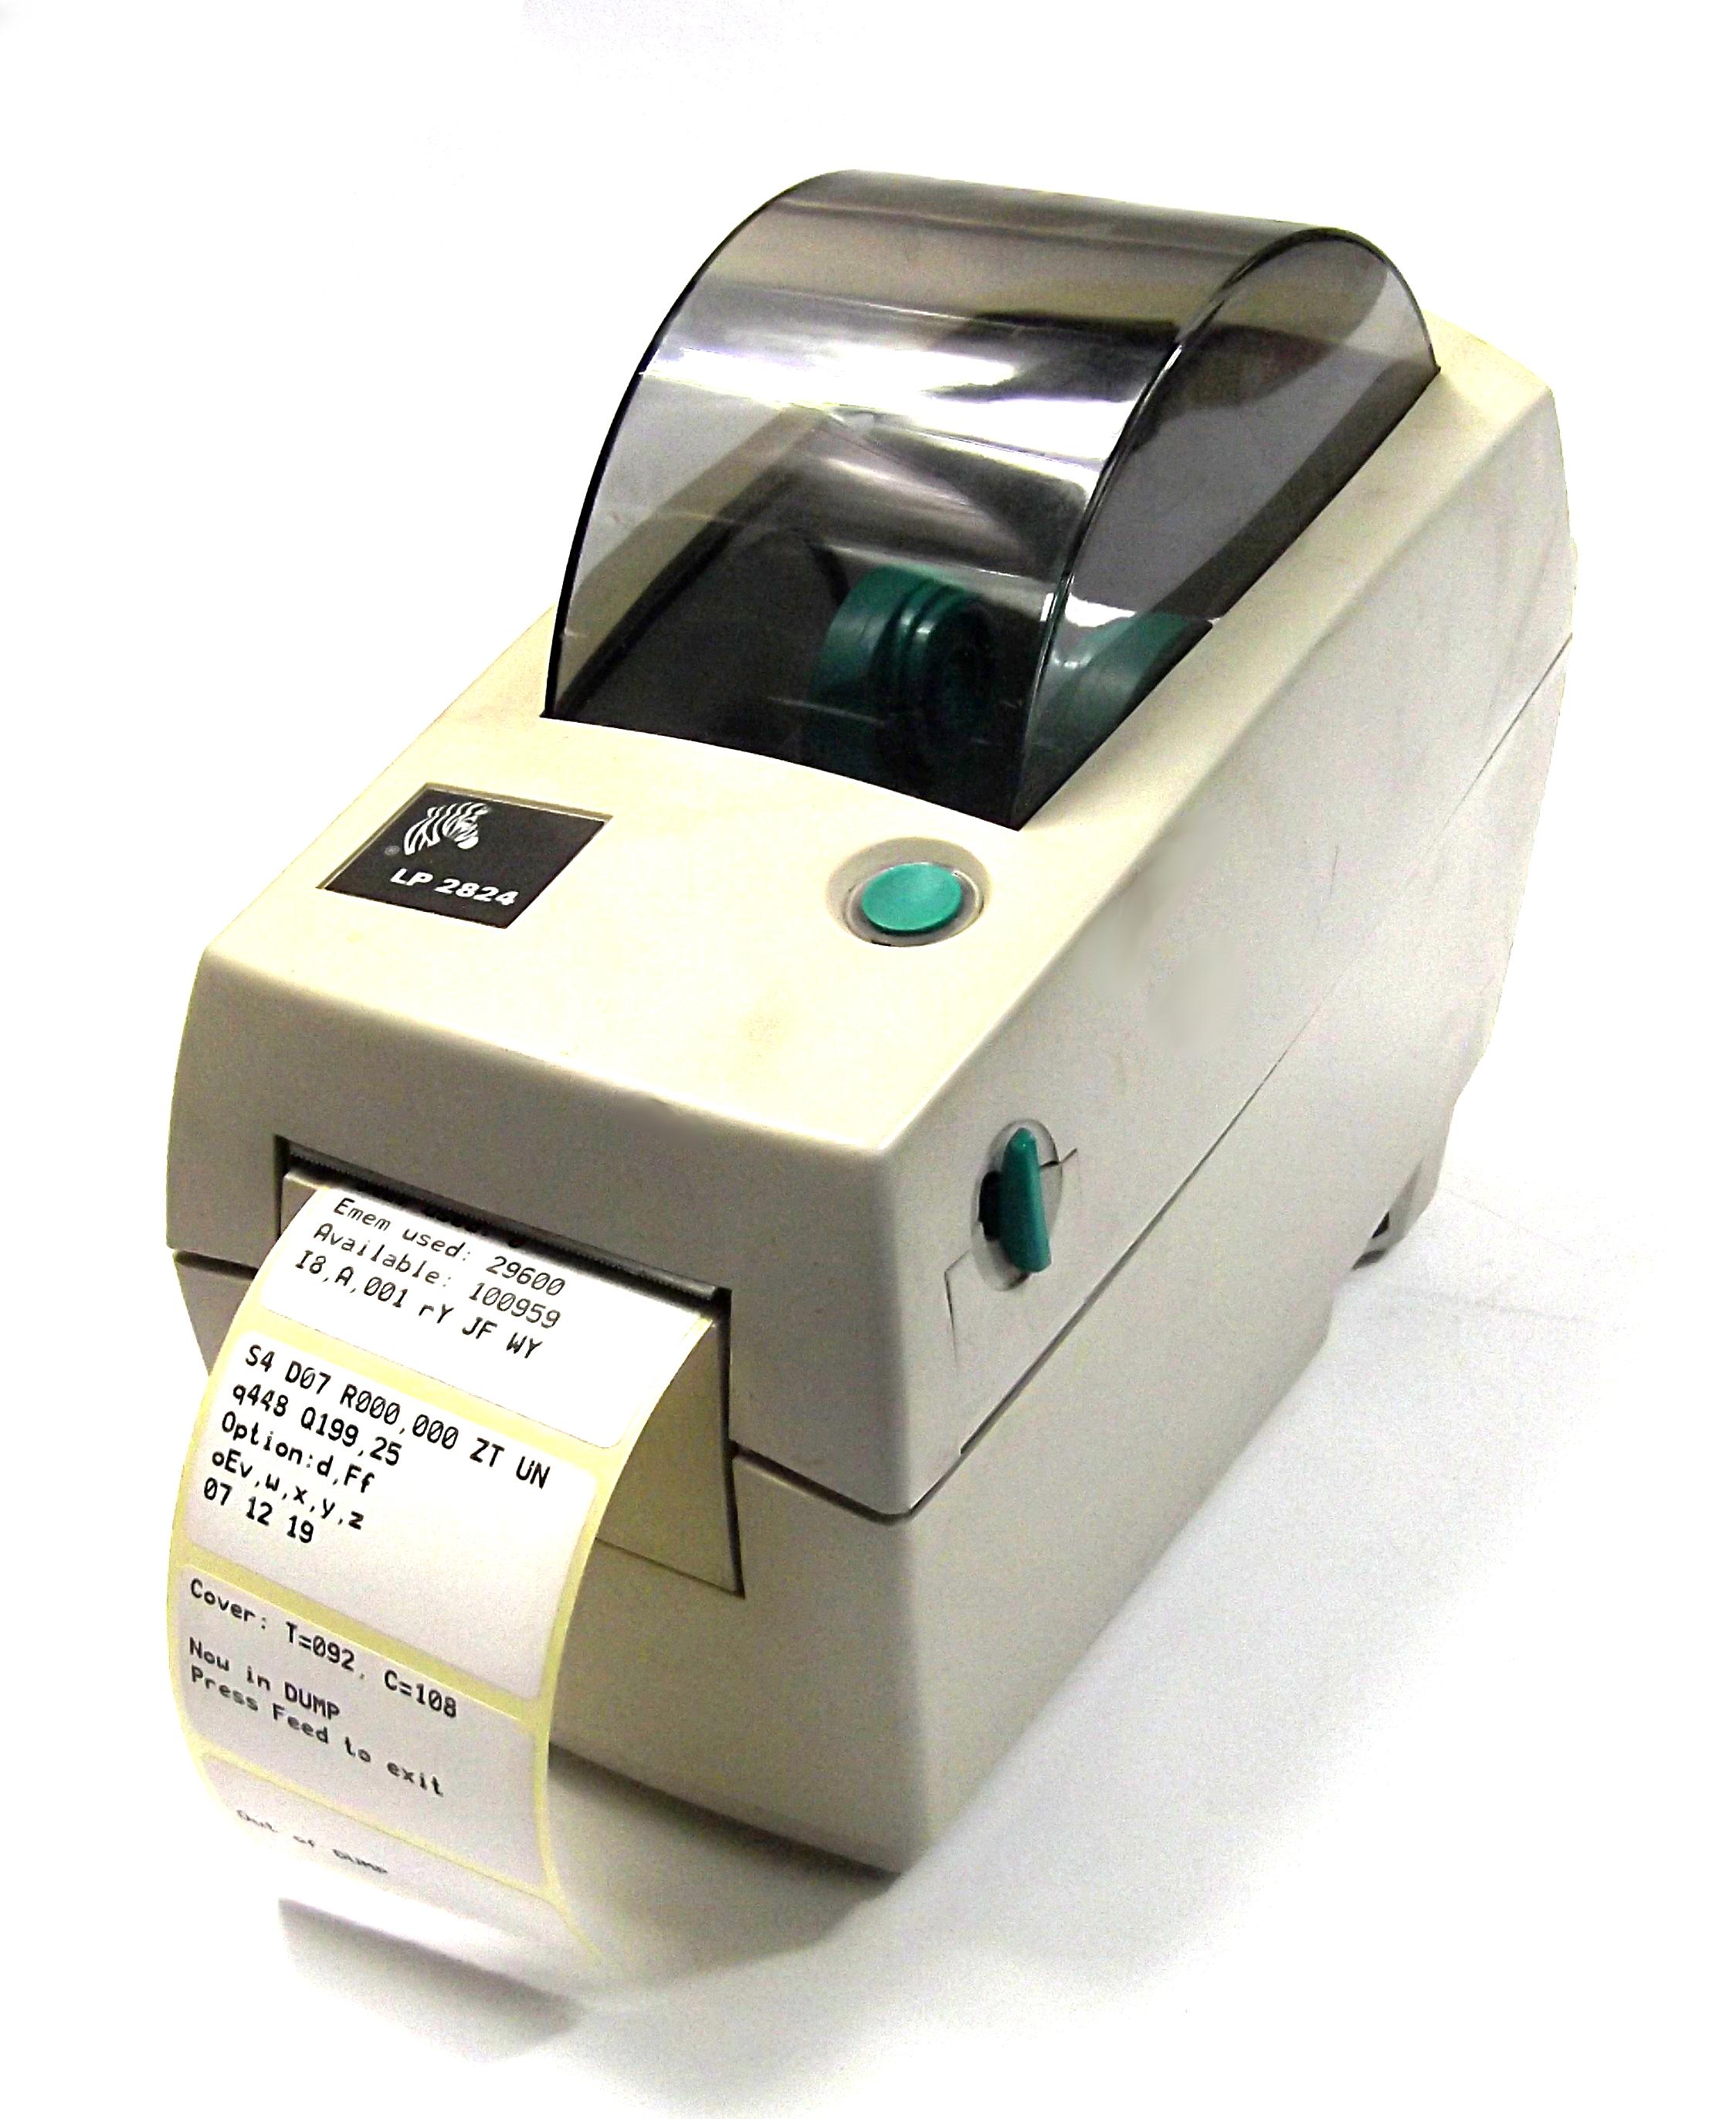 Zebra LP2824 Thermal Label Printer No AC Adapter - 2824 ...